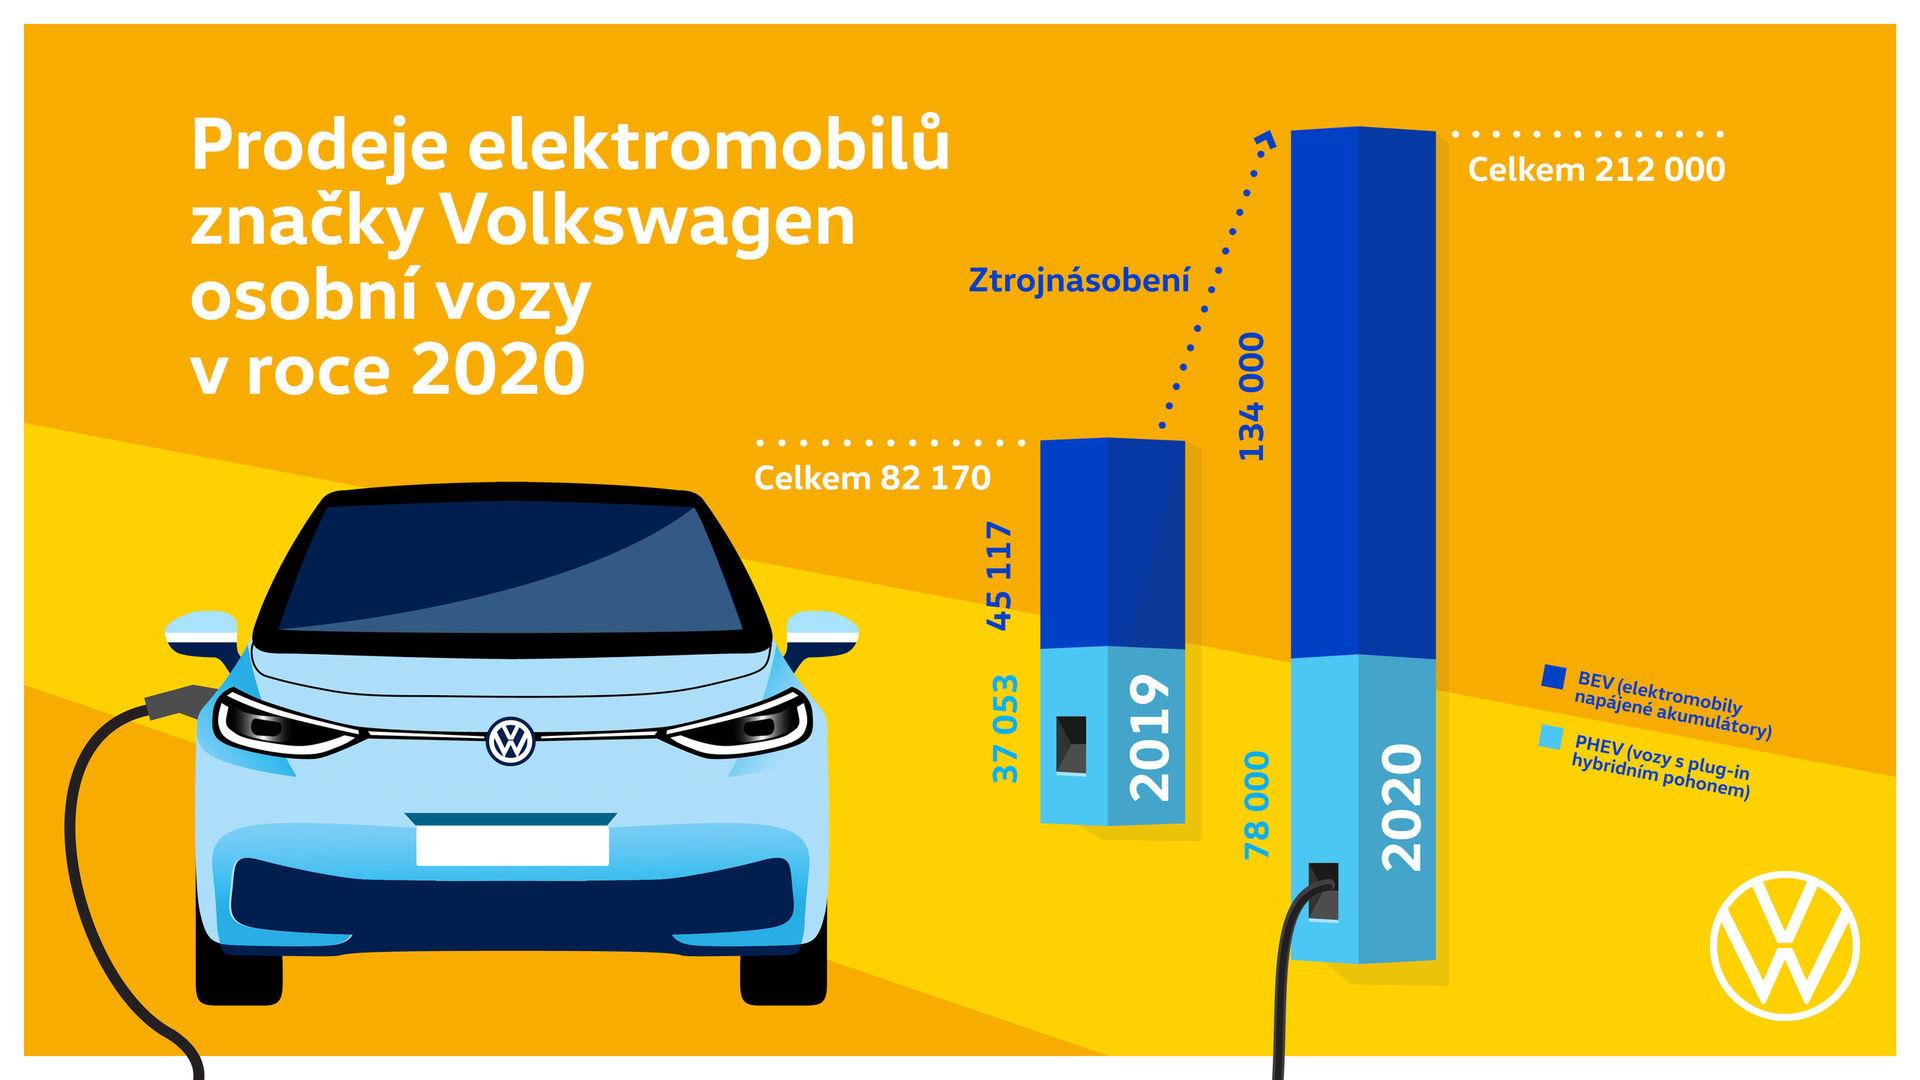 Volkswagen - prodeje elektromobilů v roce 2020